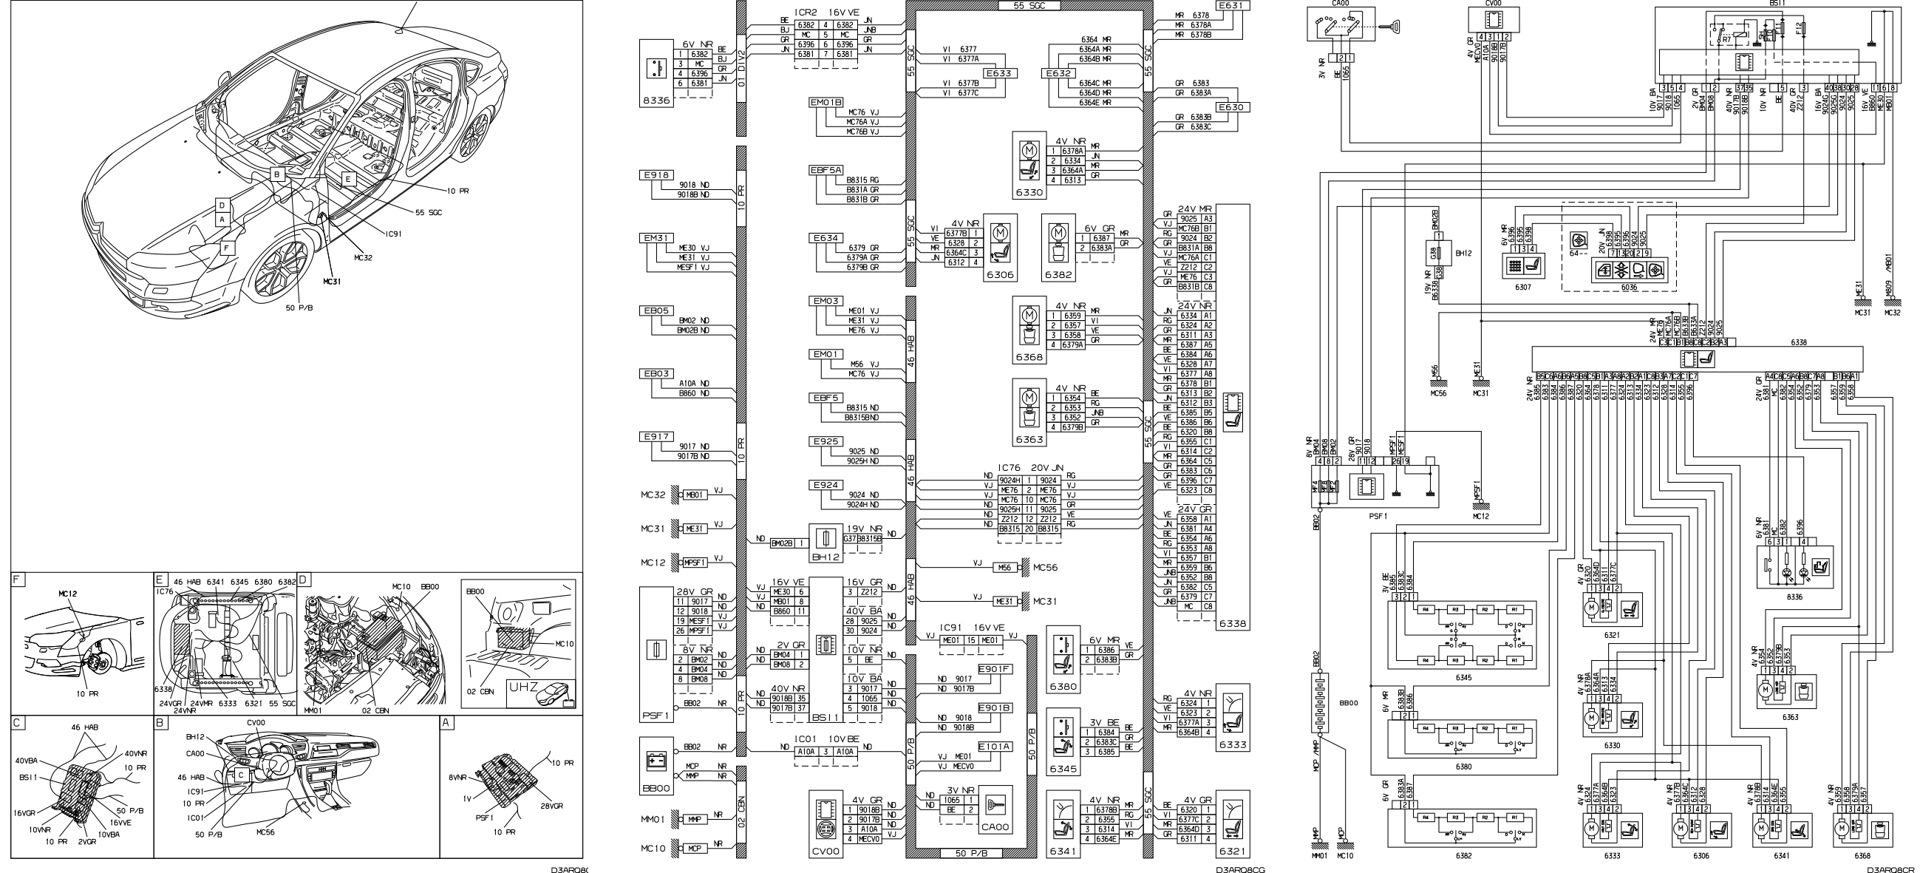 hight resolution of citroen c2 1 4 hdi wiring diagram electrical work wiring diagram u2022 citroen c2 1